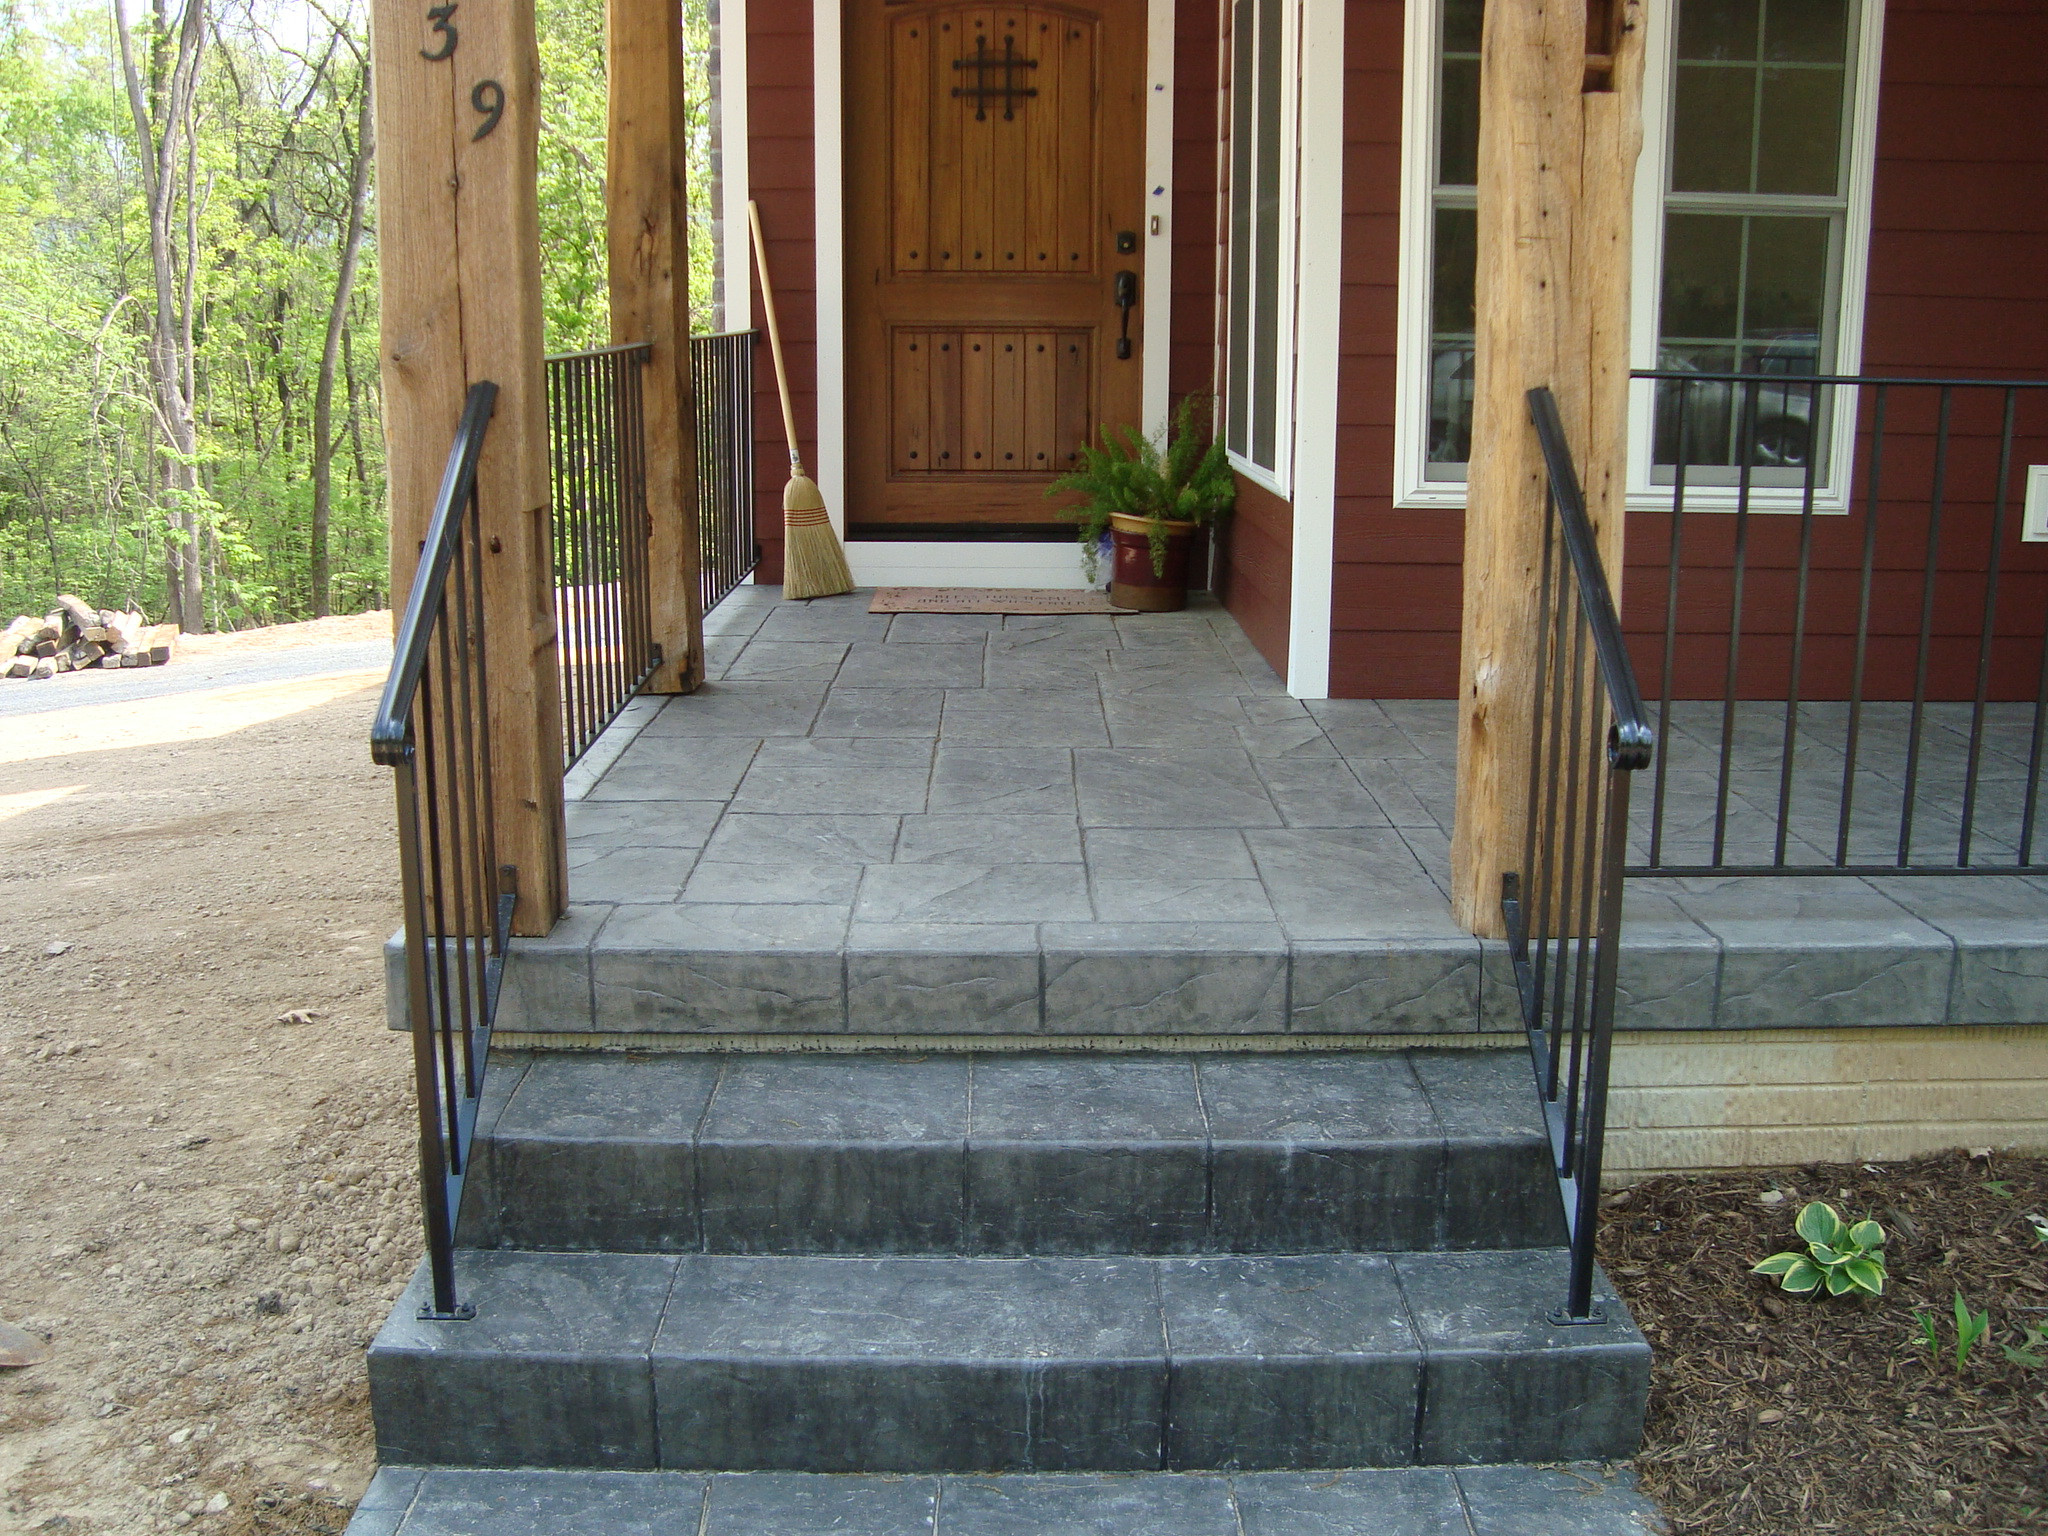 Concrete patios with steps porch amp steps strasburg - Concrete porch steps ideas ...